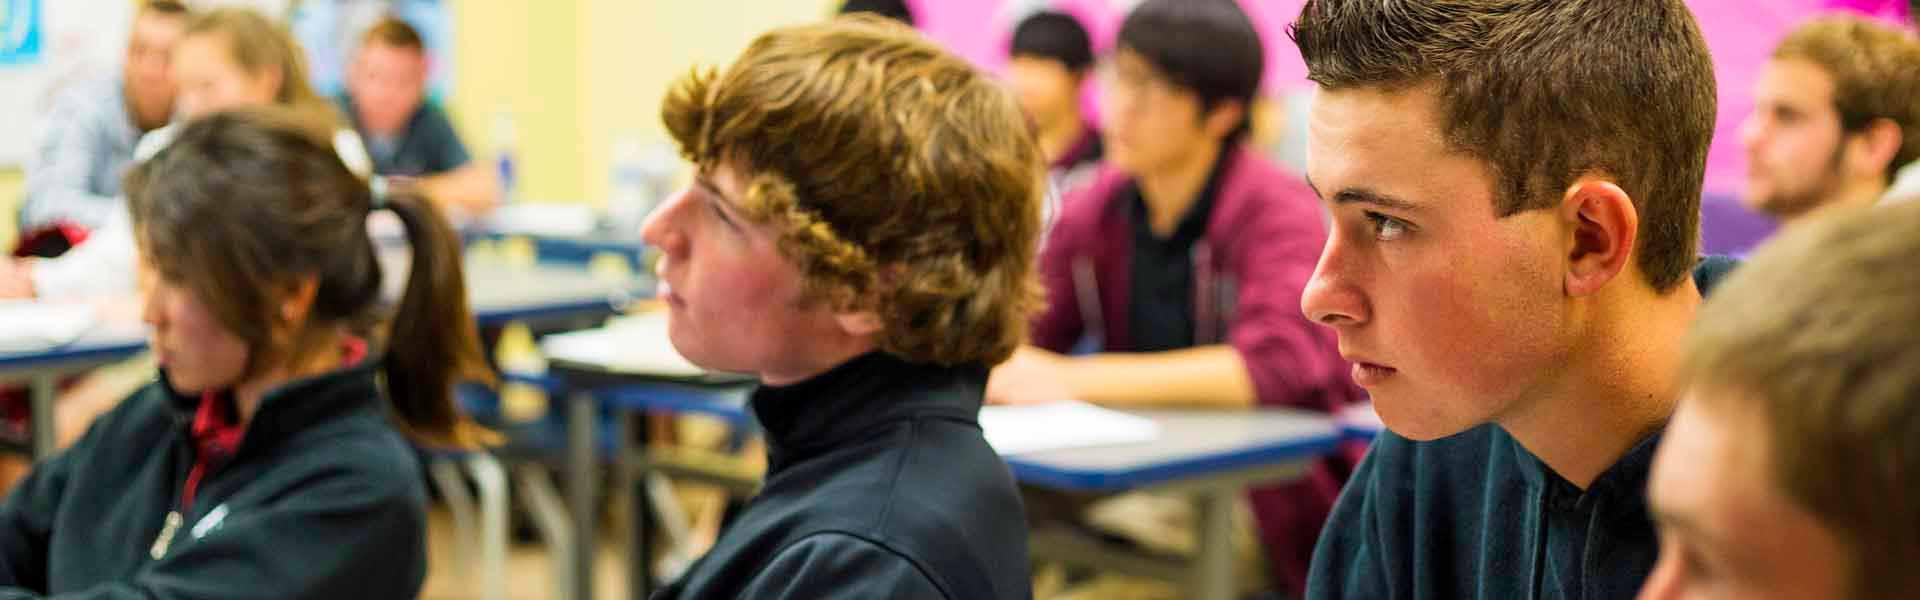 Lakemary-highschool-FL-Students-Main-BAnner